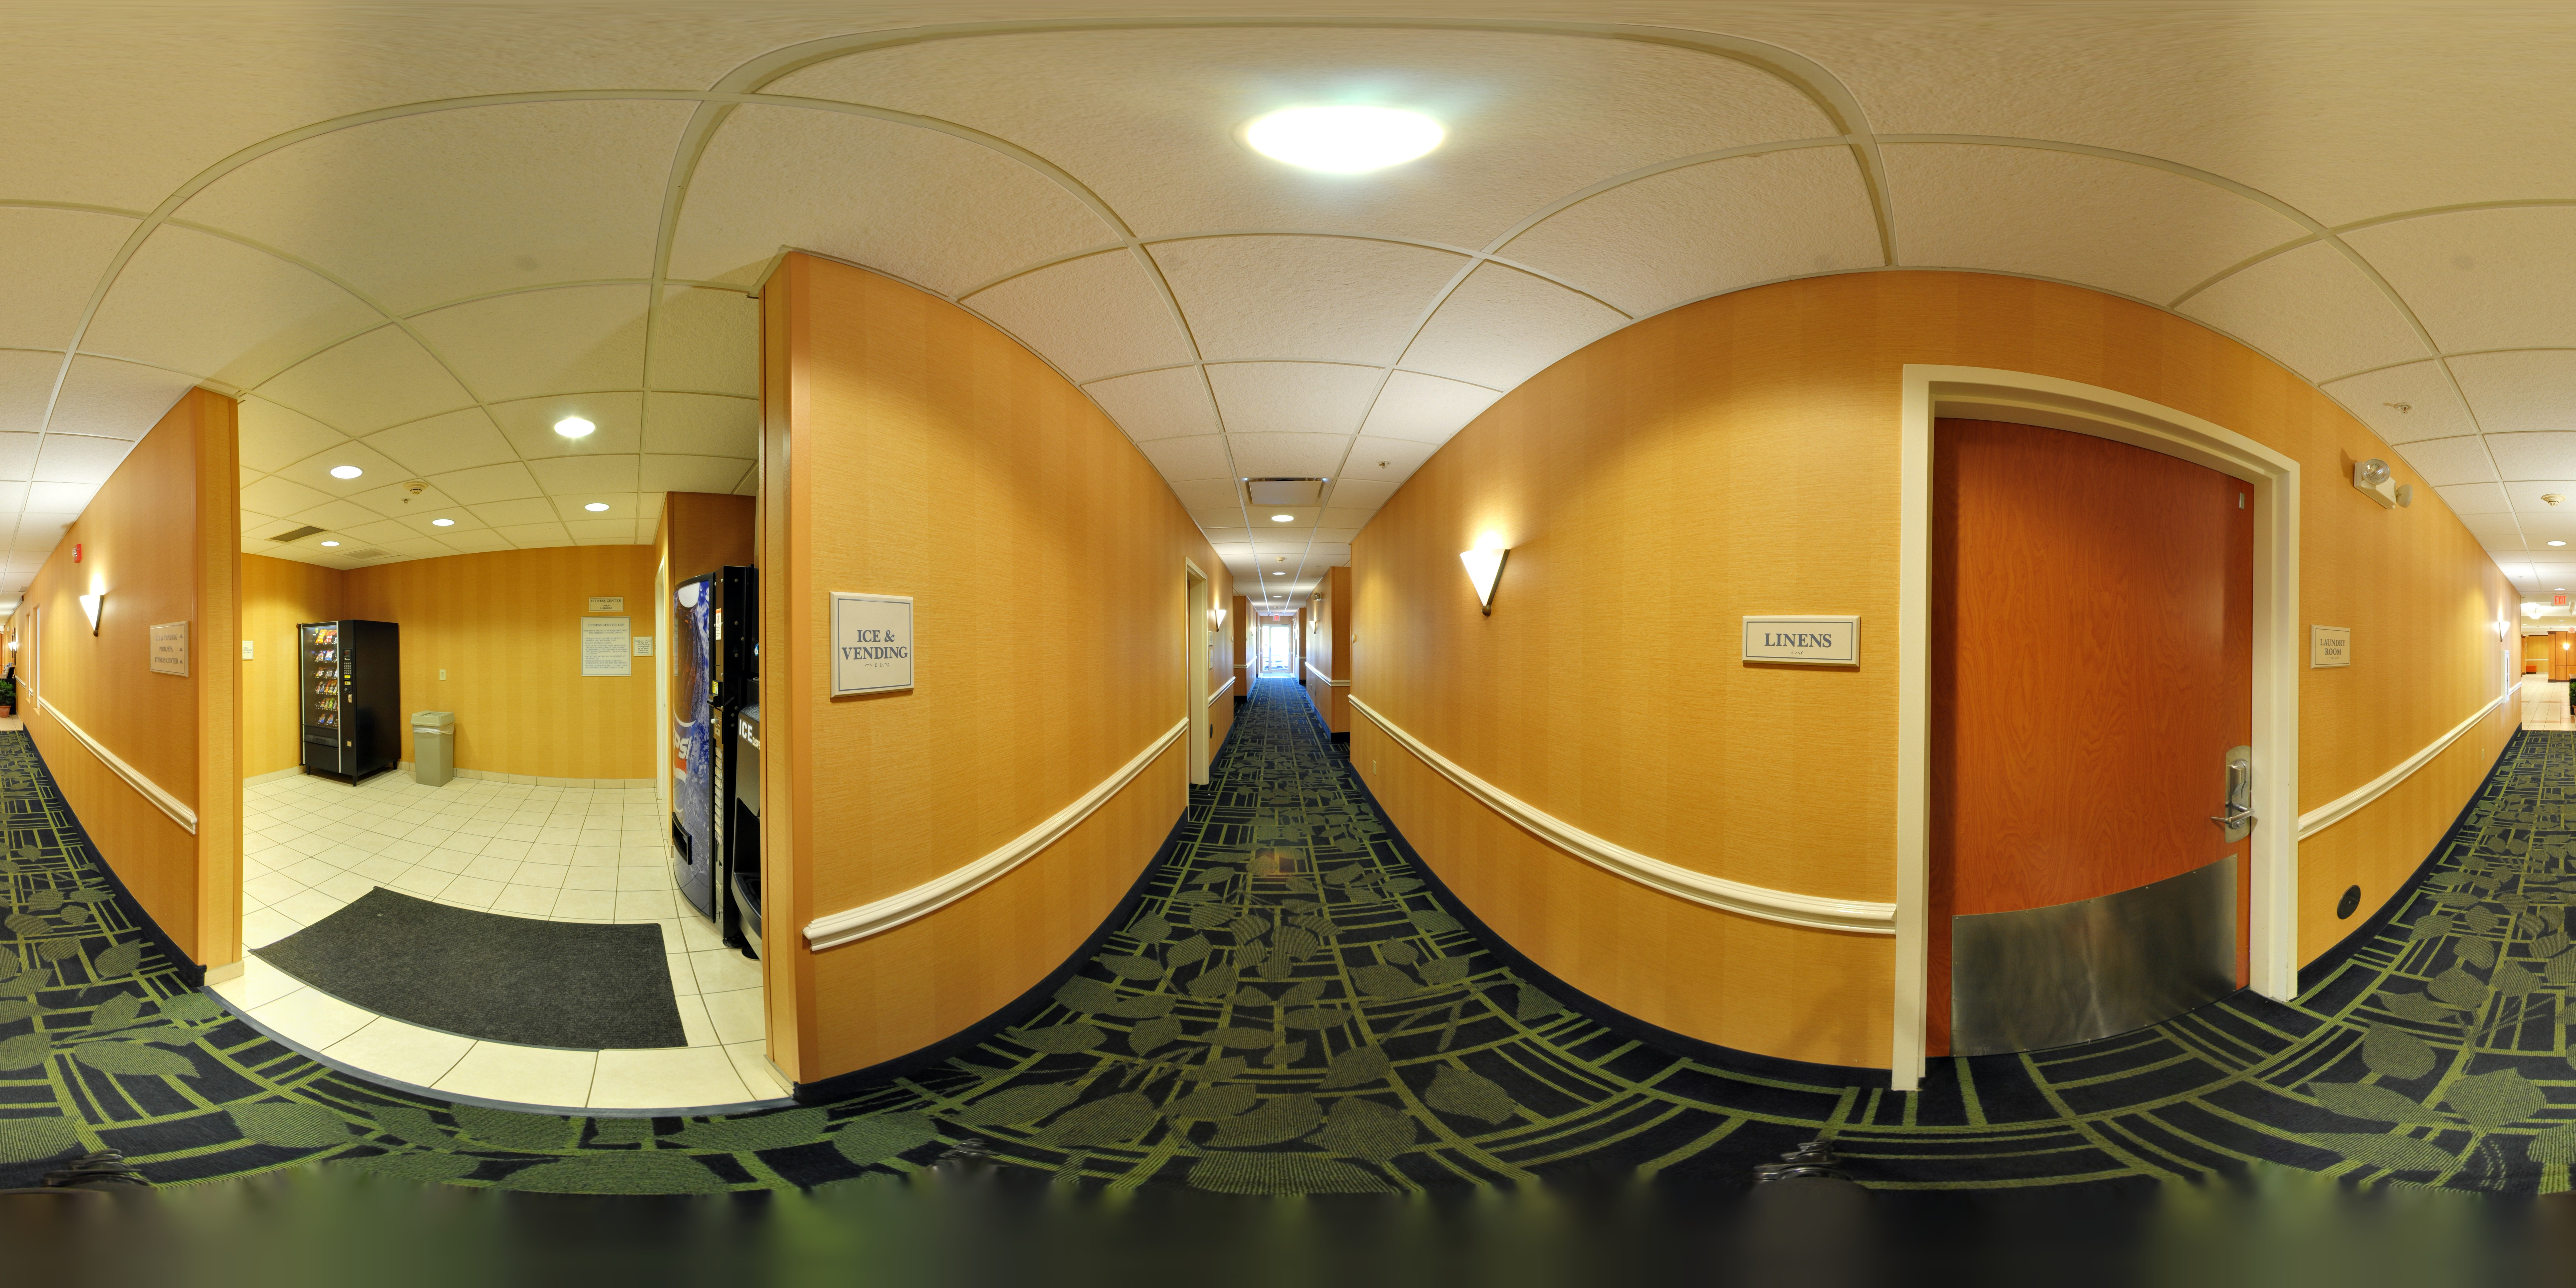 Fairfield Inn & Suites by Marriott Akron South image 31